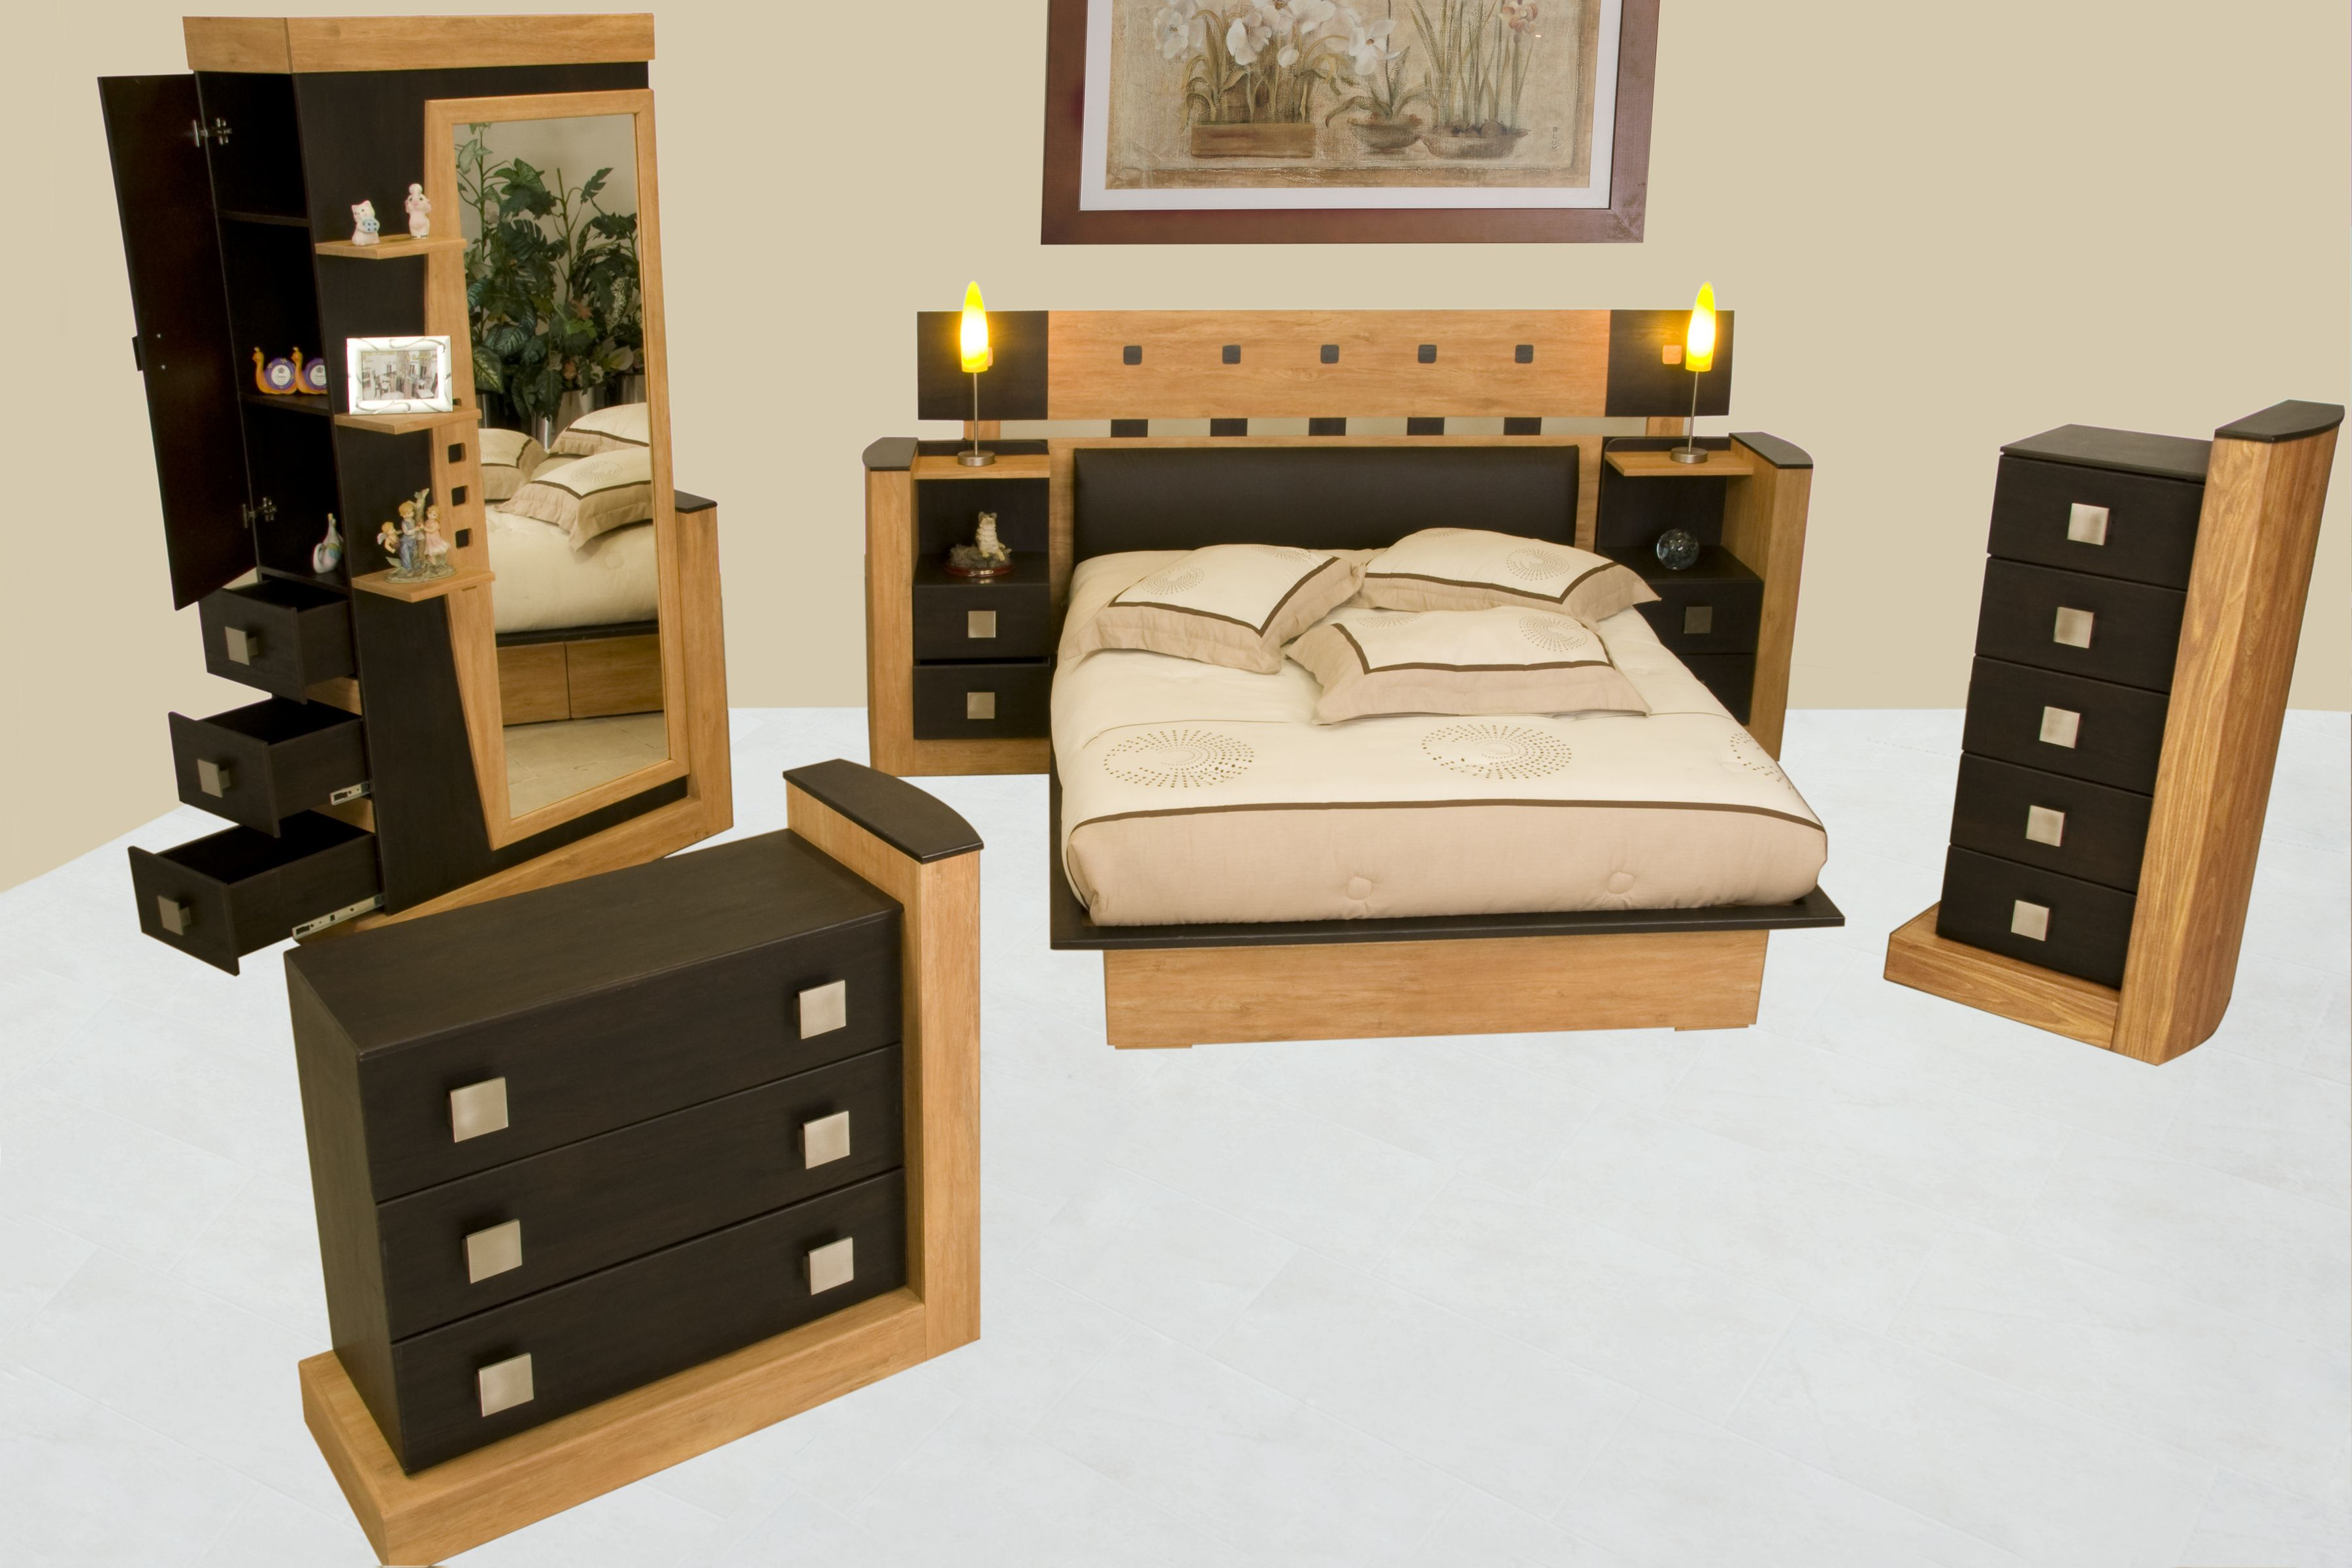 RECAMARA 4 PZAS KENIA - Muebles TroncosoMuebles Troncoso ...